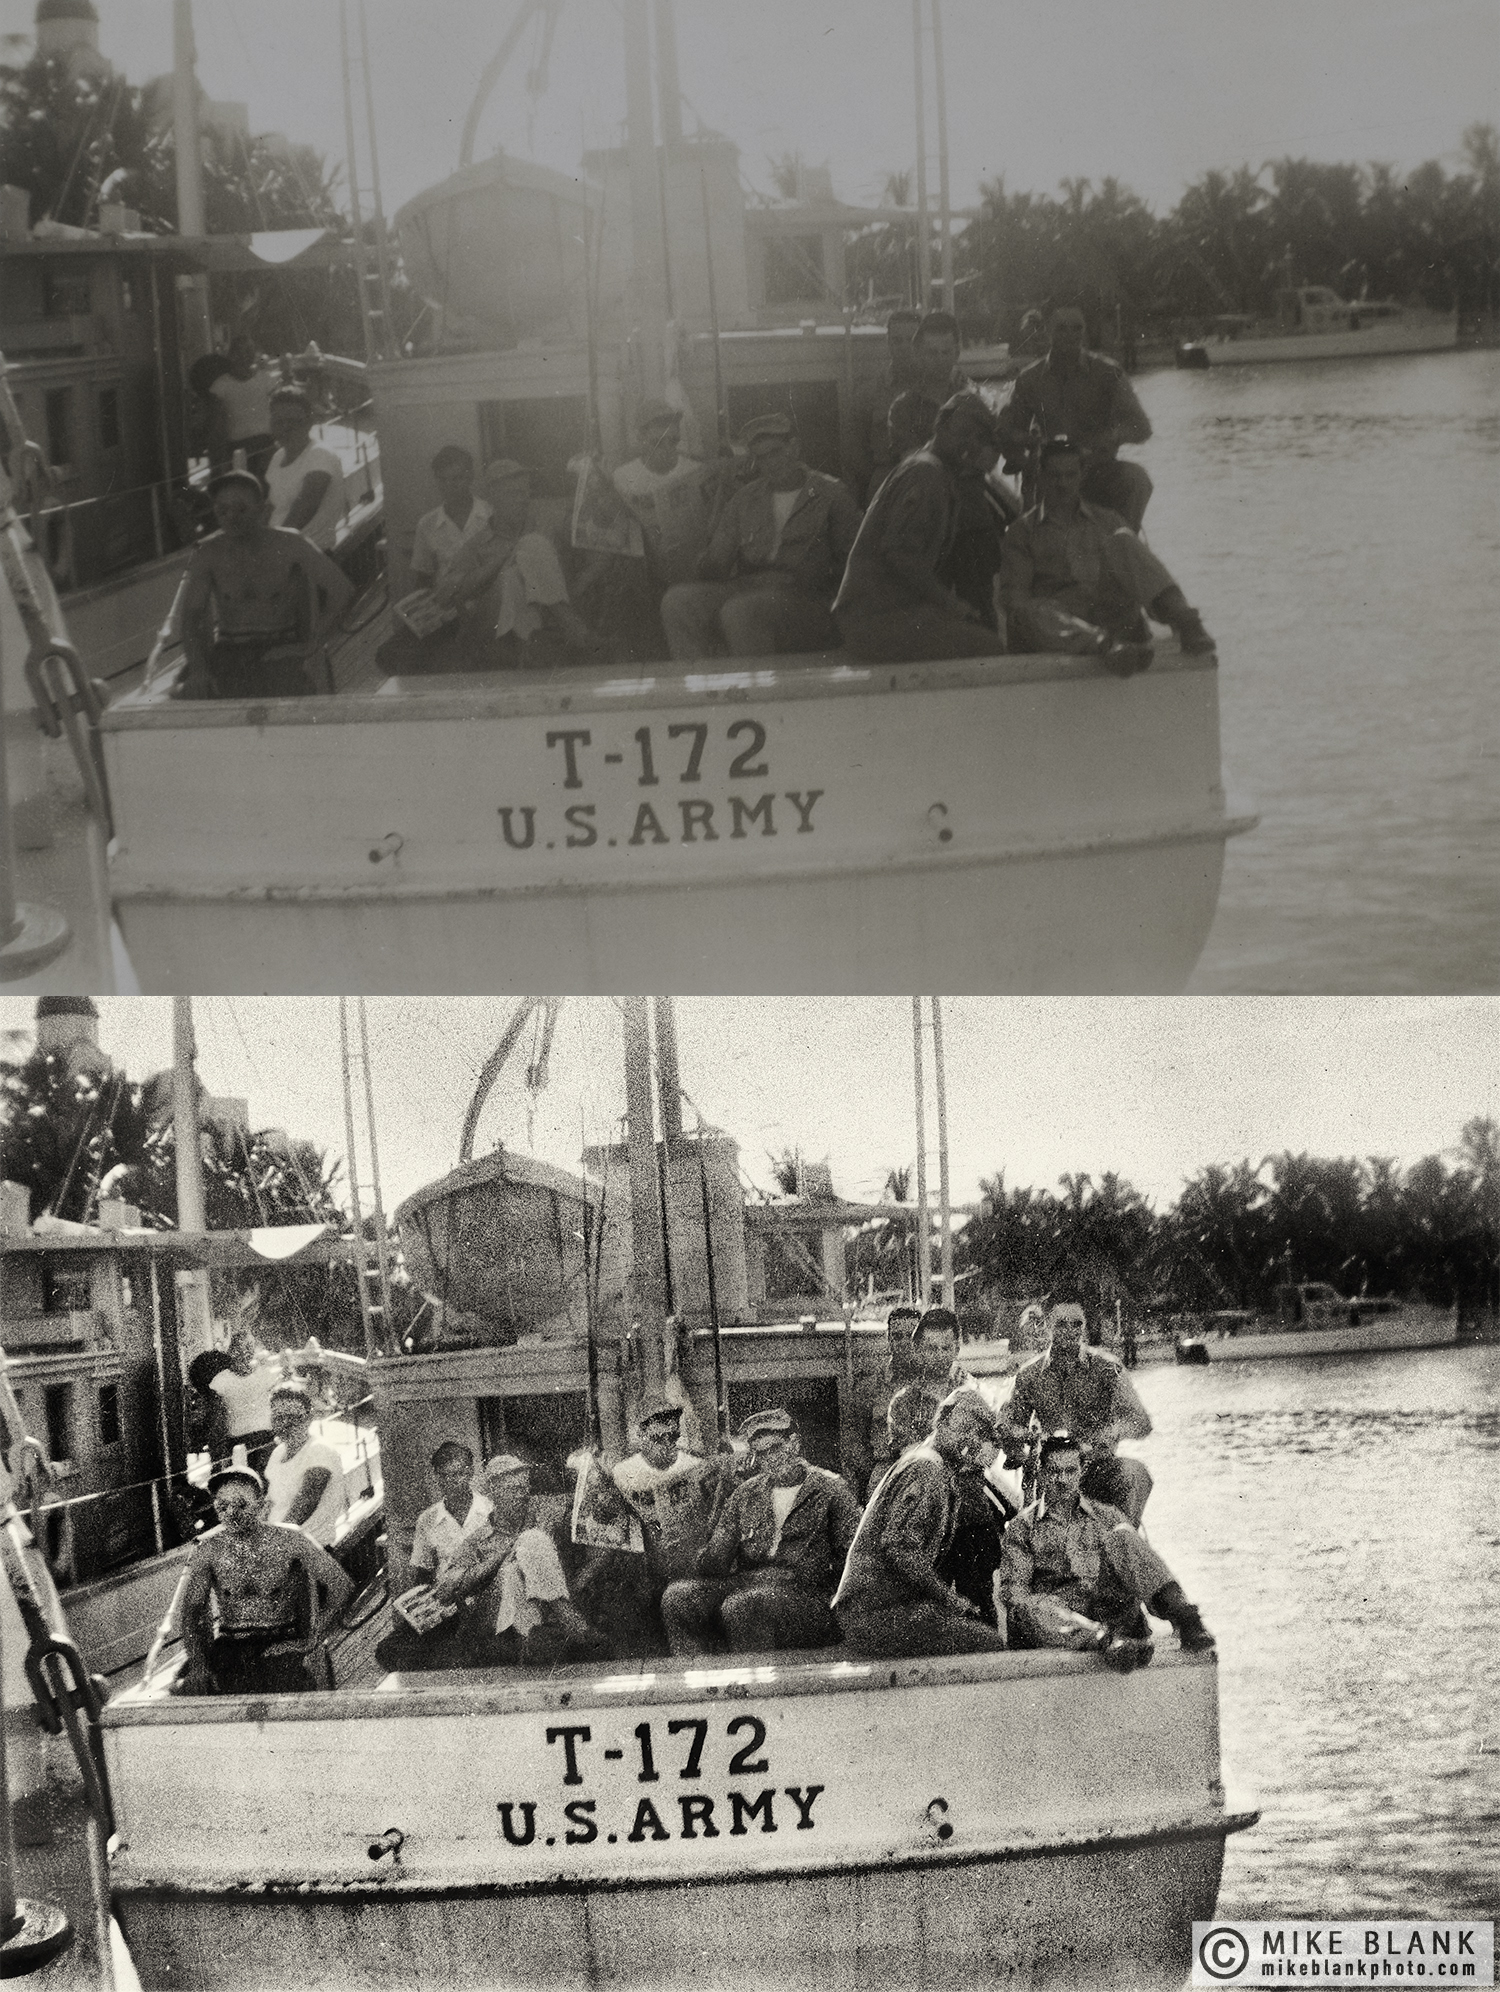 Digital restoration: US Army MPs, fishing trip, Florida, 1946